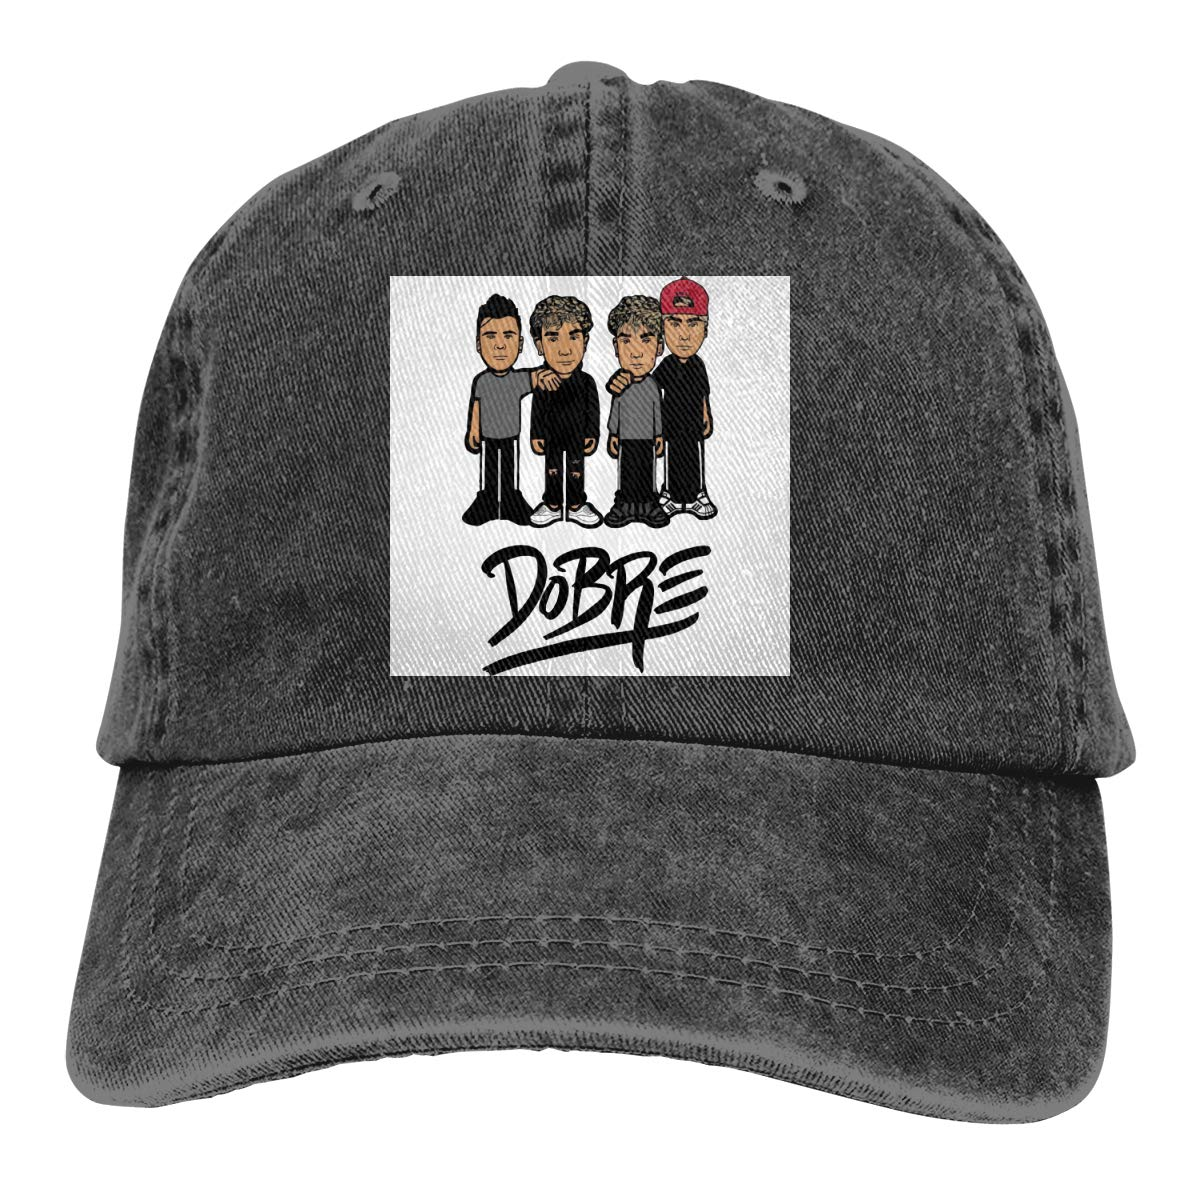 Rodney L Robbins Dobre Brothers Unisex Adjustable Personal Hat